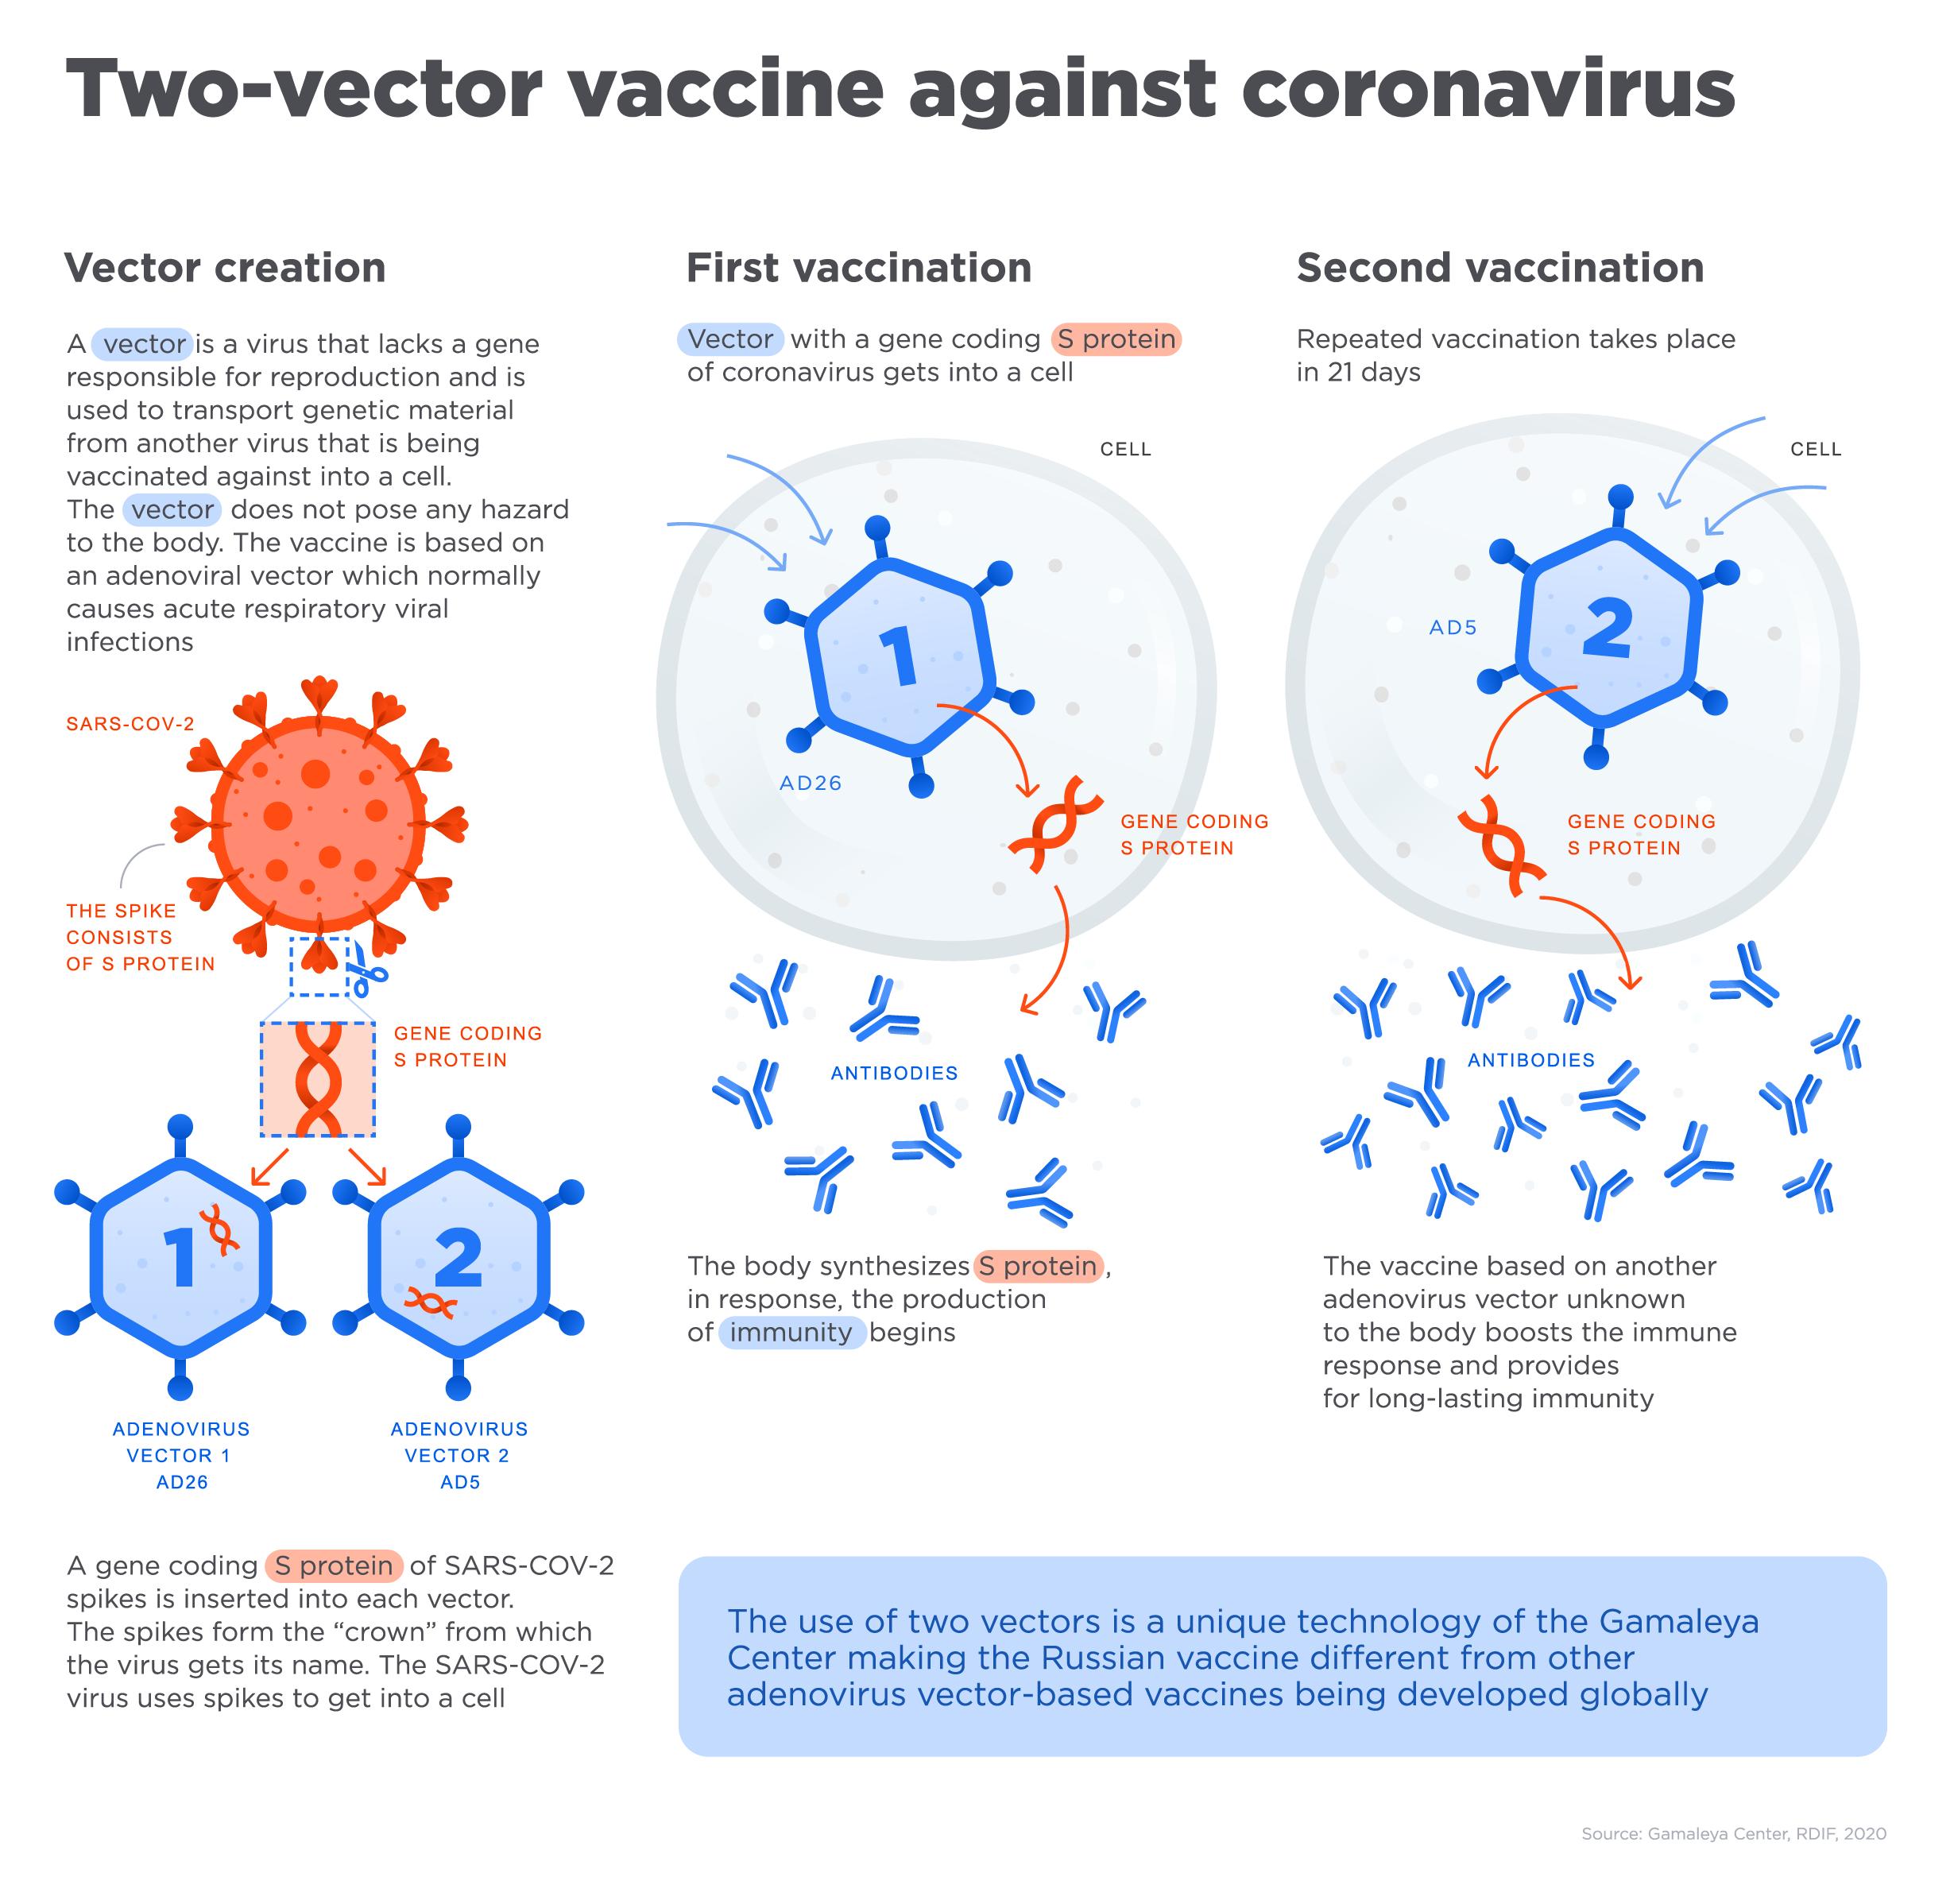 Two-vector vaccine agains coronavirus